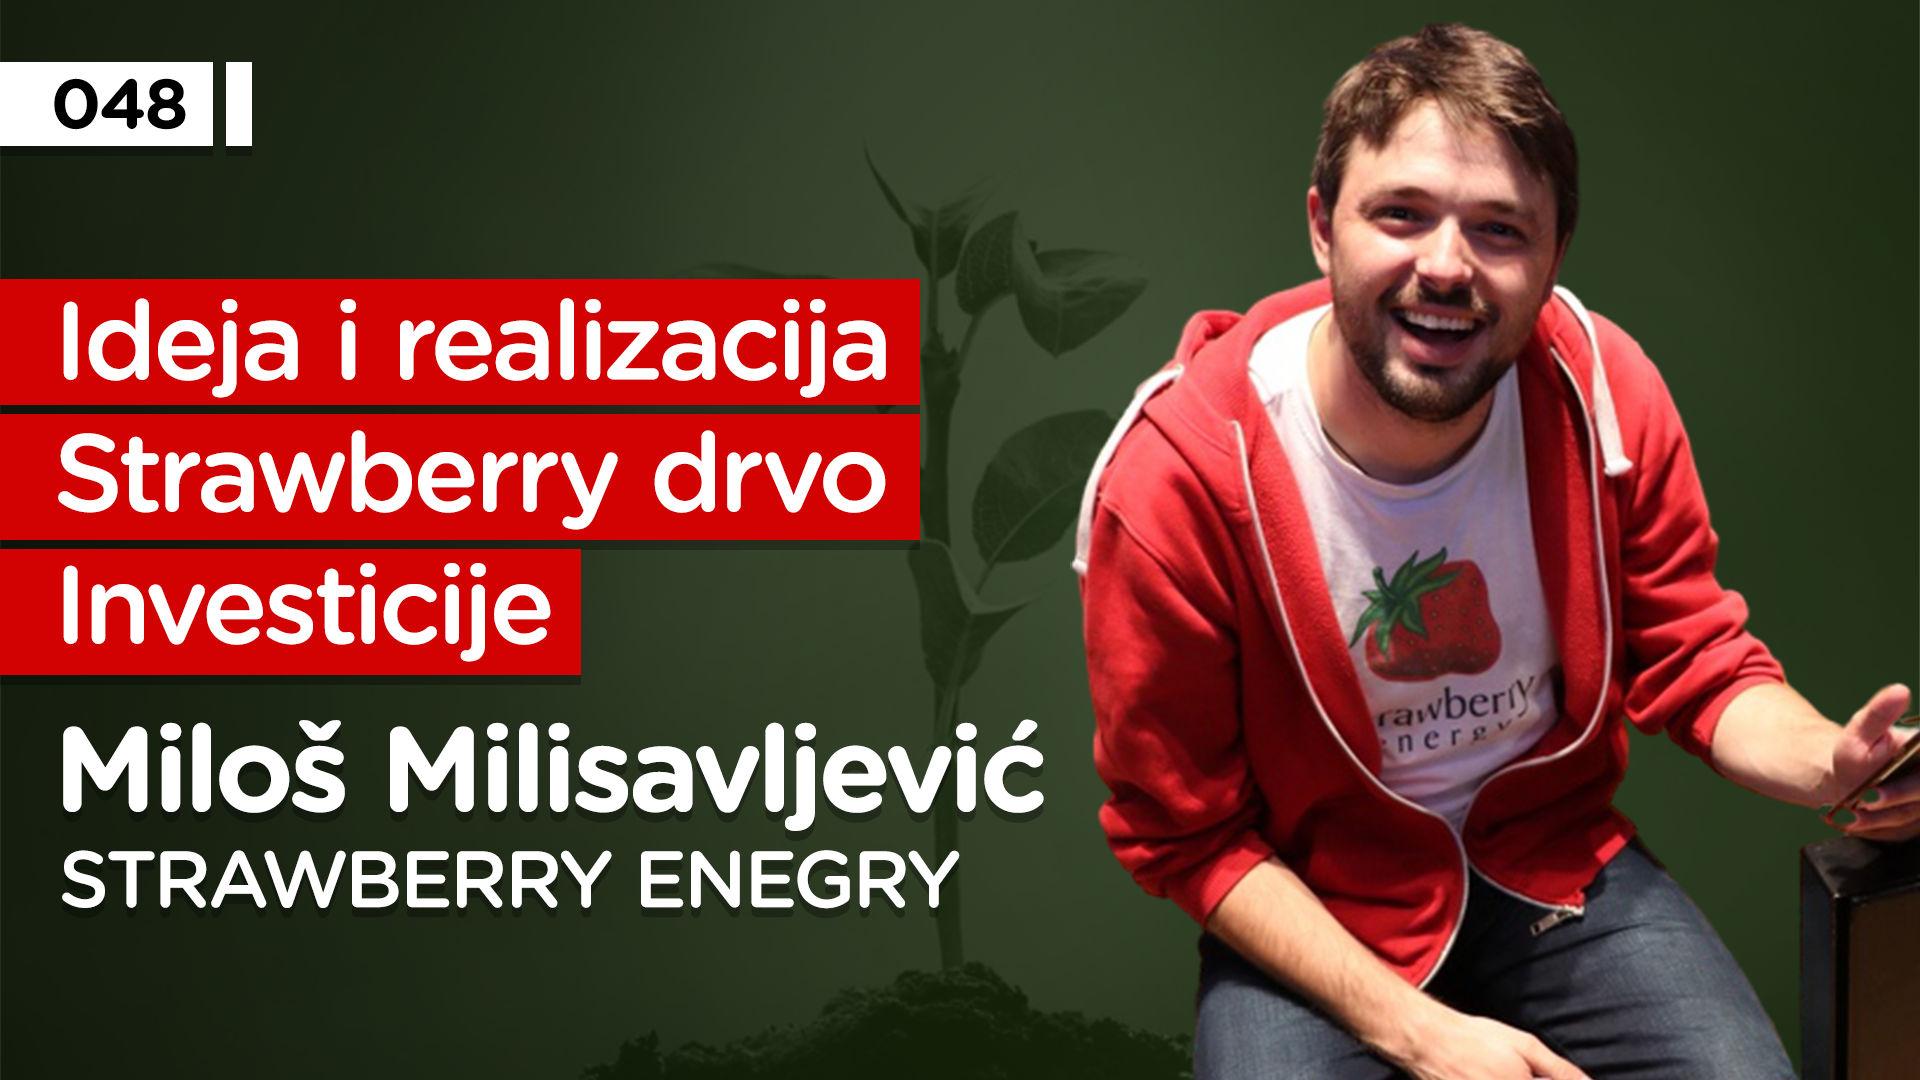 EP048: Miloš Milisavljević